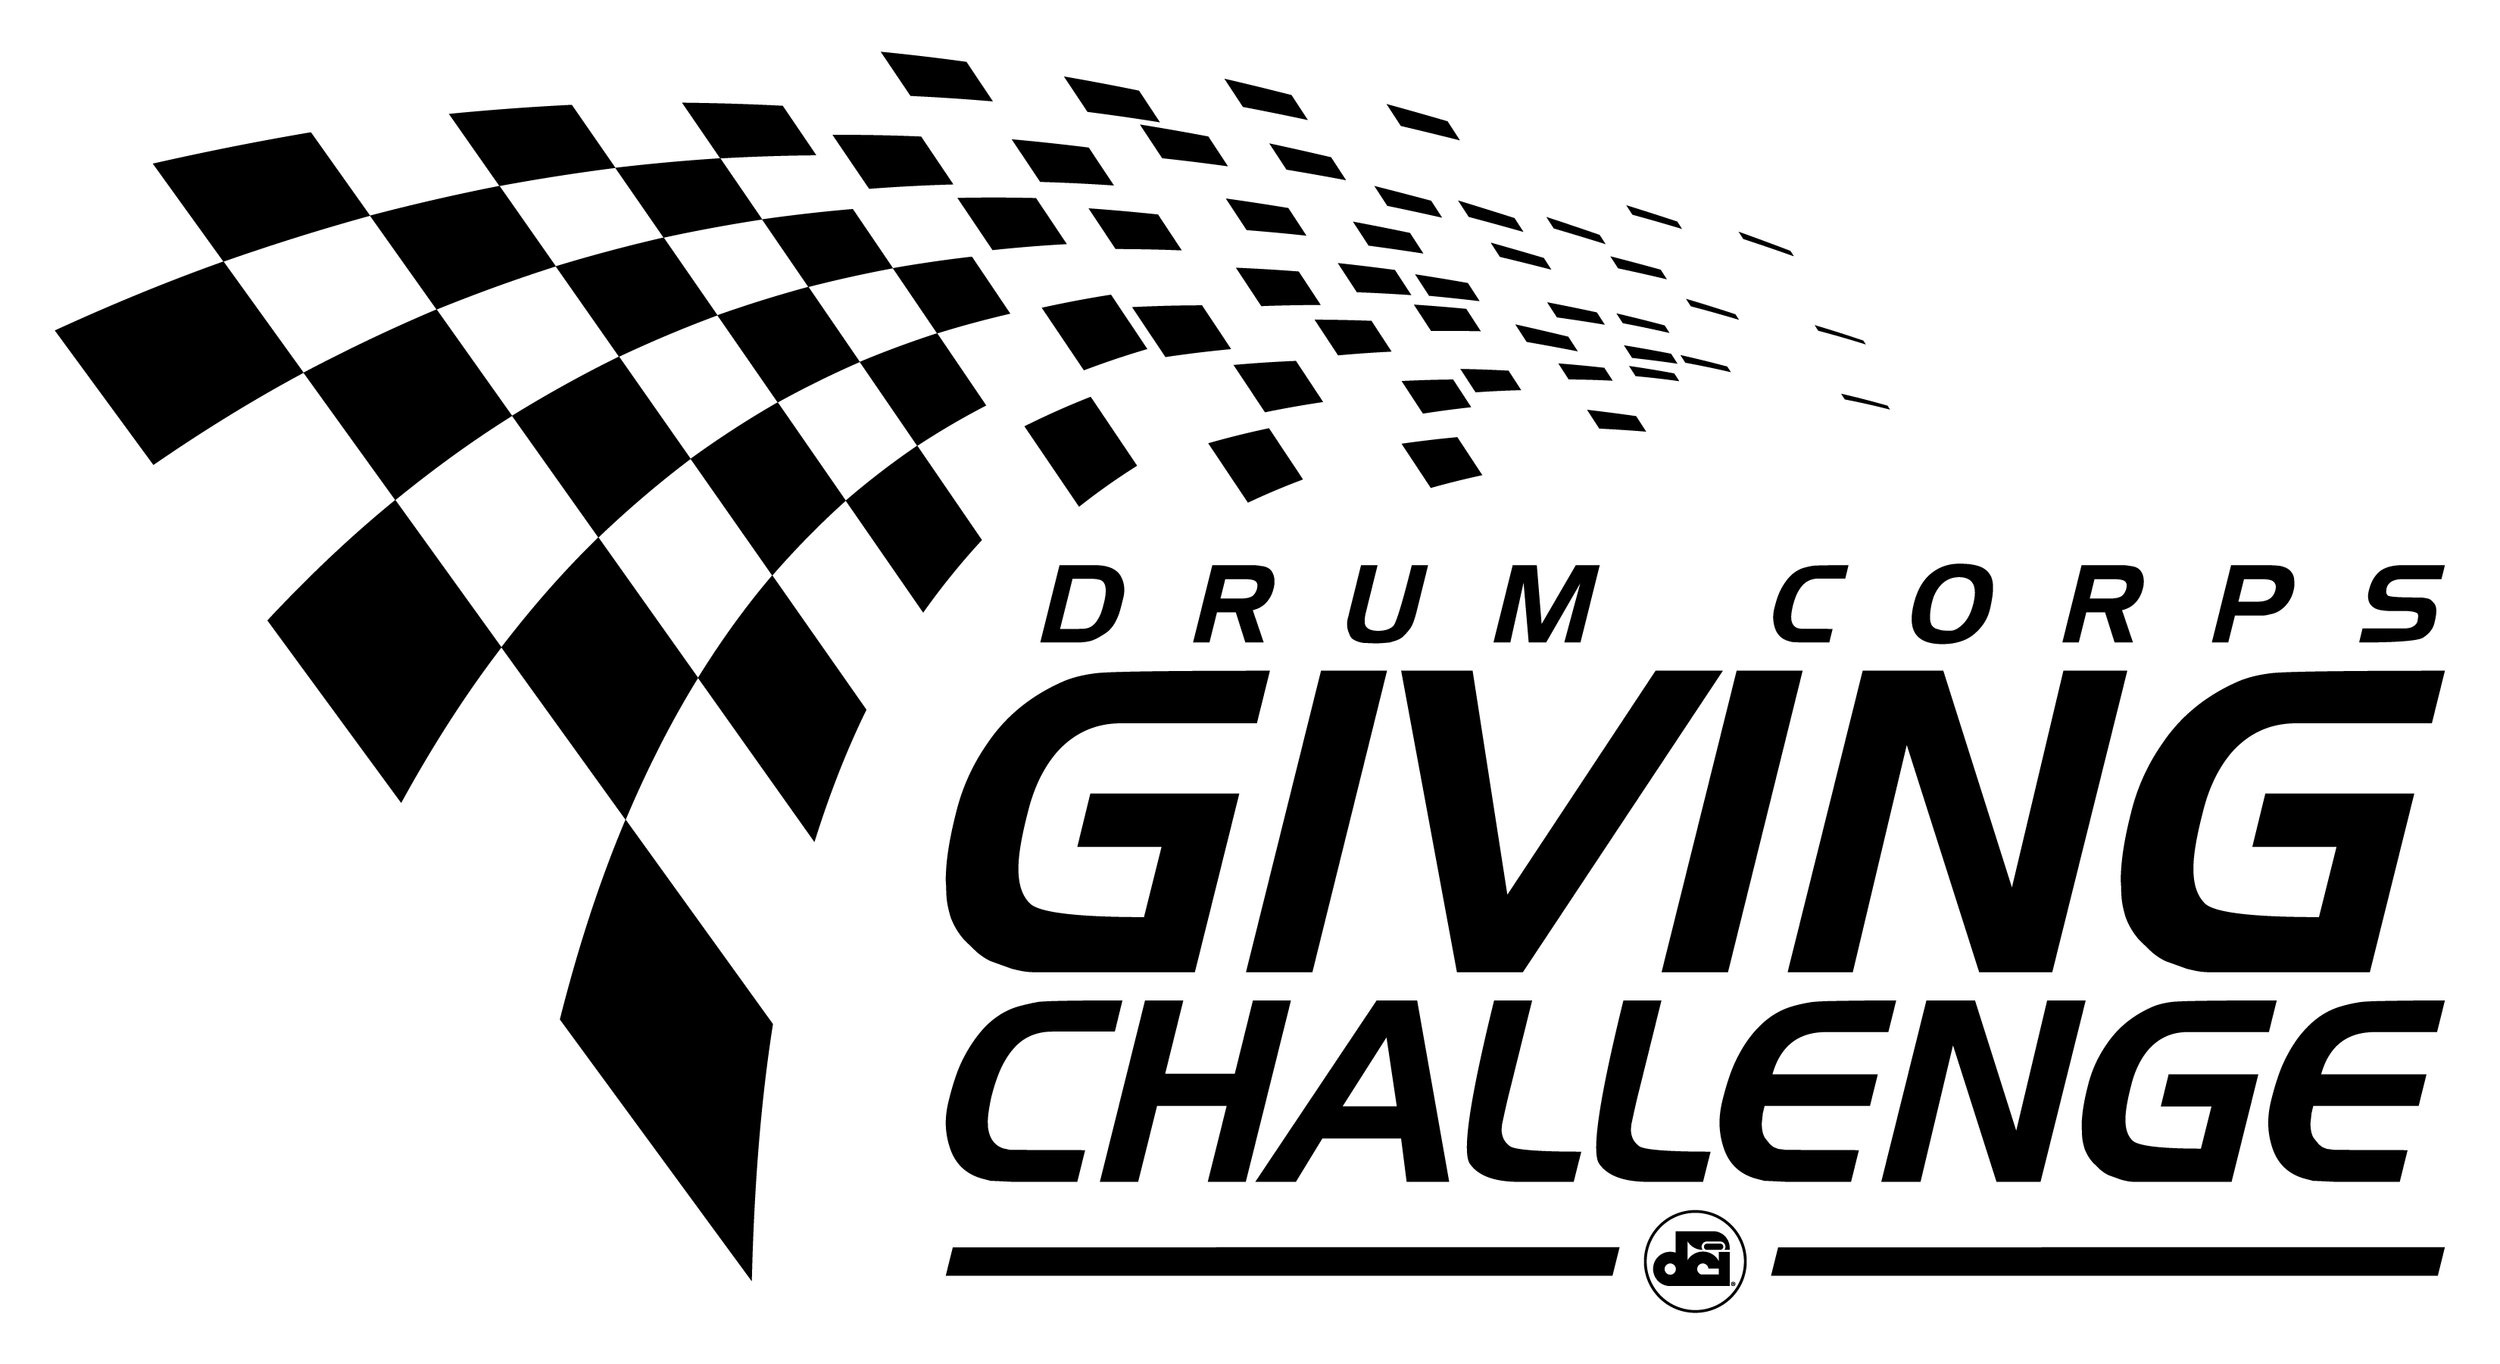 Drum_Corps_Giving_Challenge_Black-01.jpg